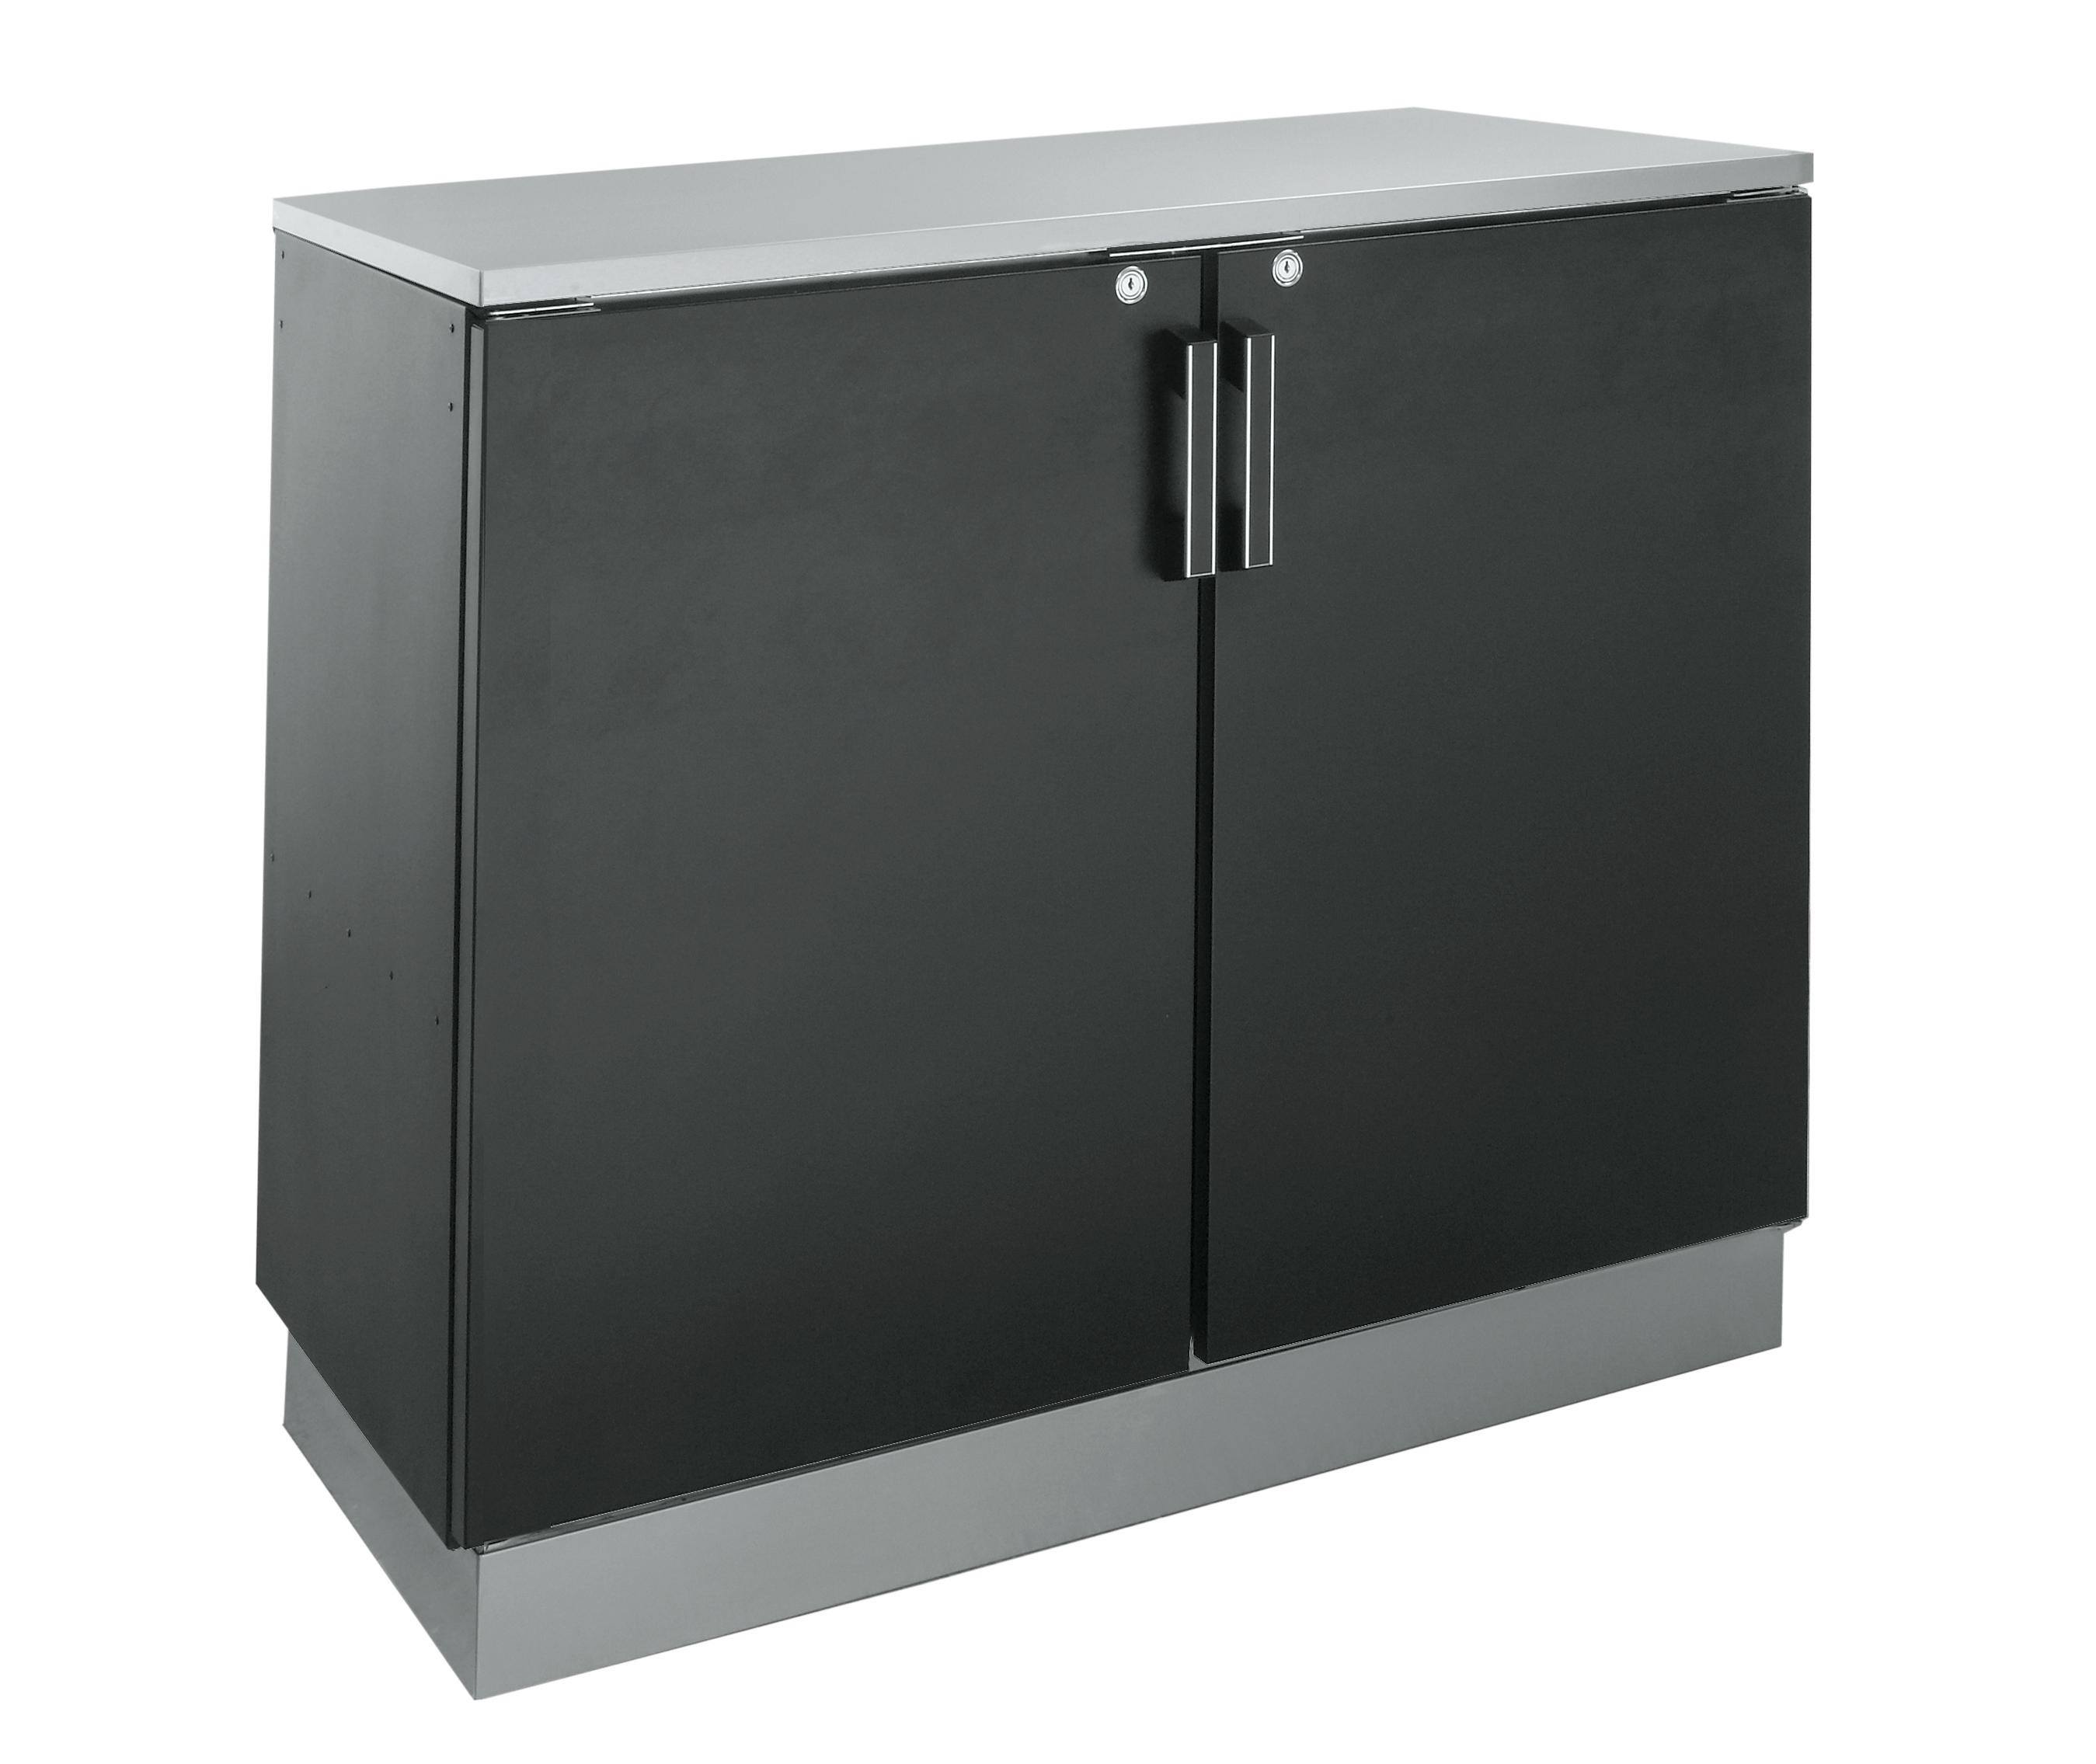 Krowne Metal BD48 back bar cabinet, non-refrigerated